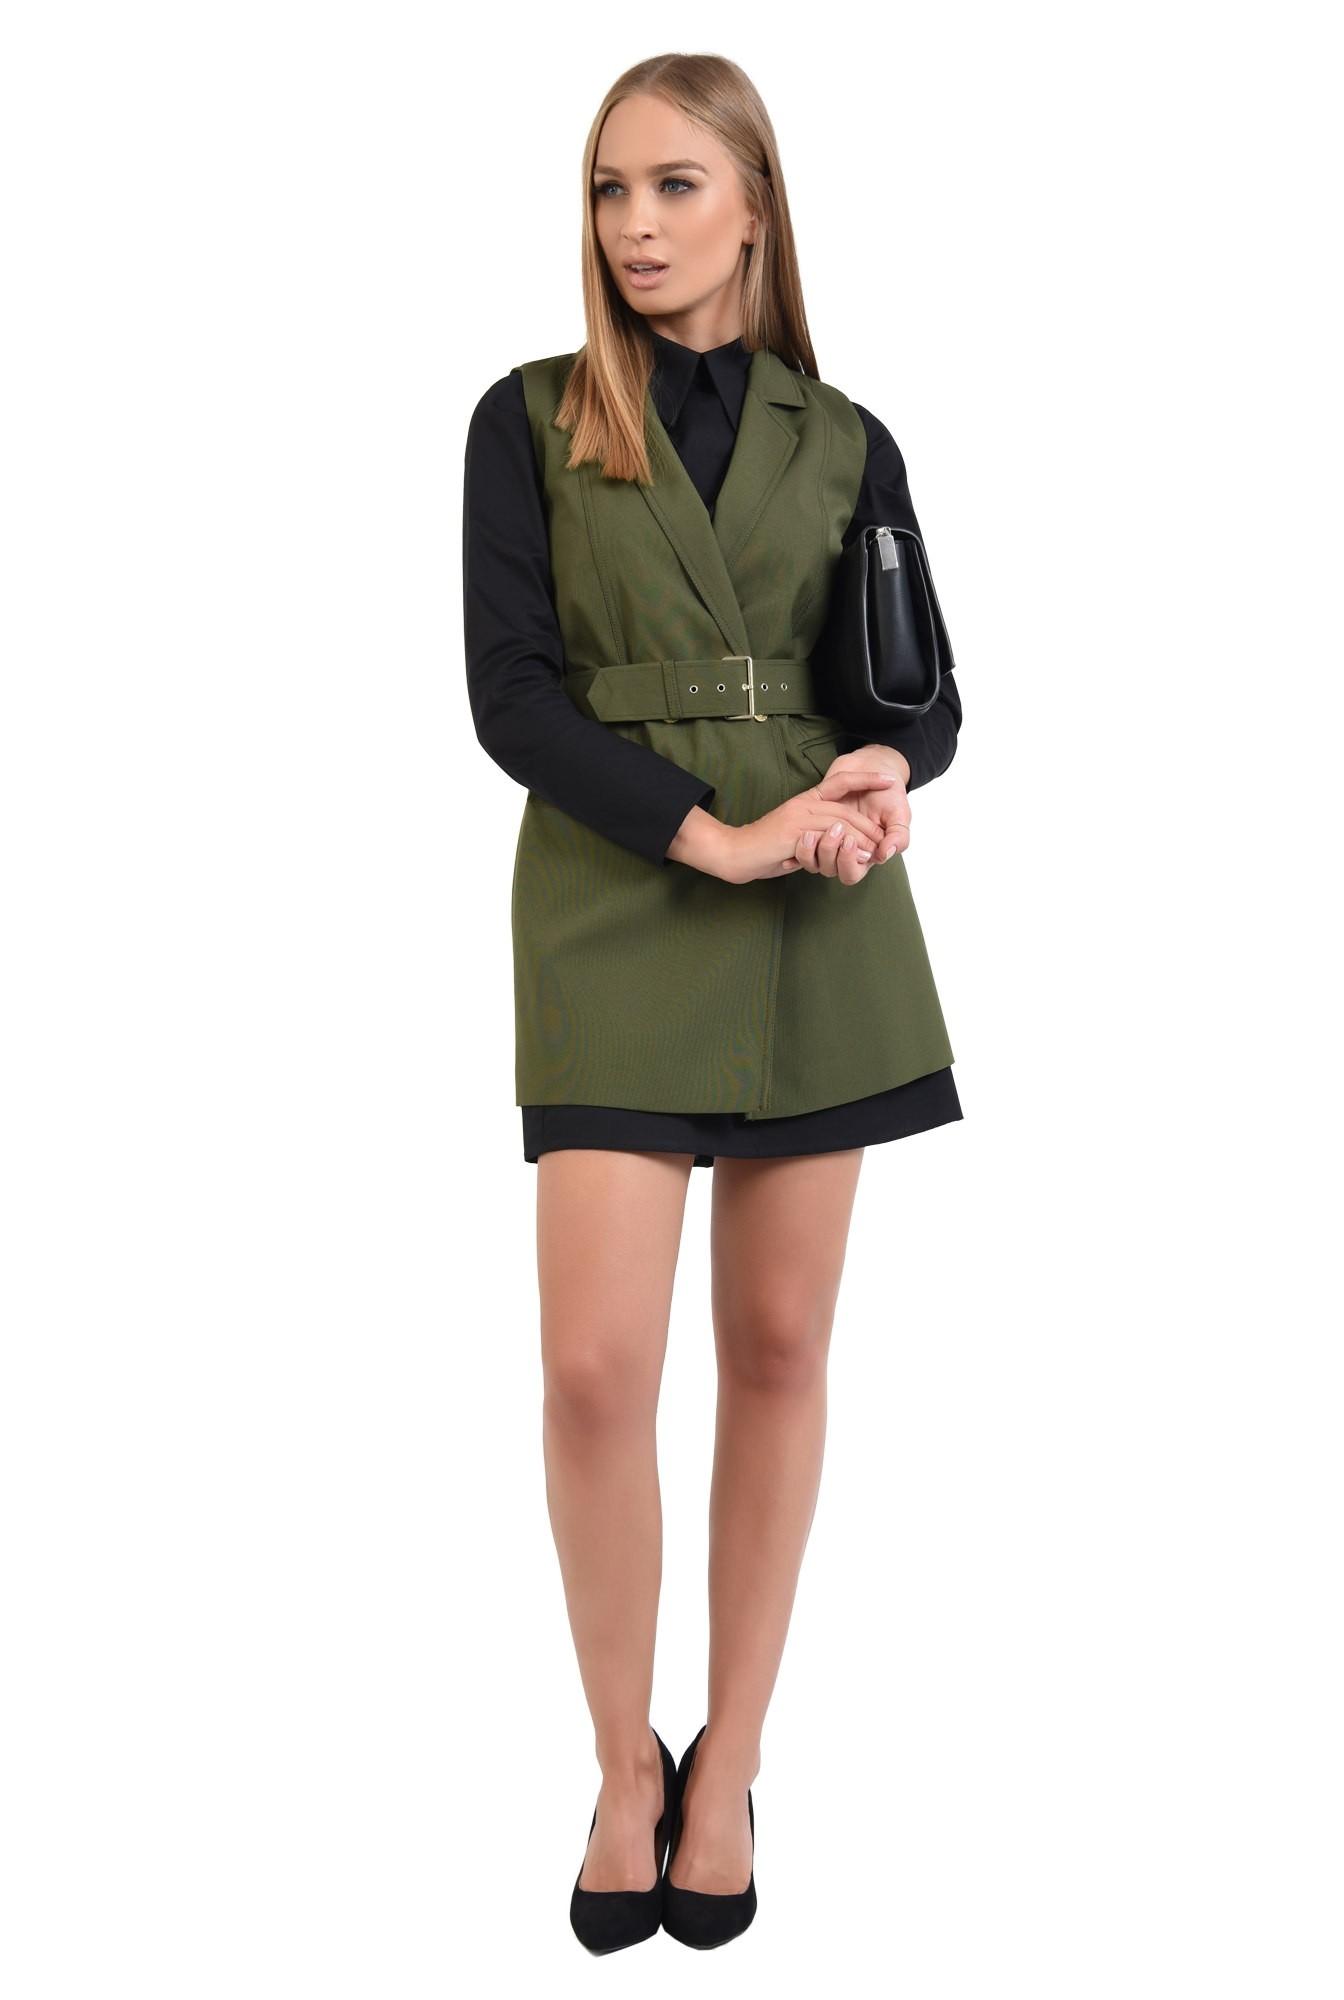 0 - rochie casual, stil camasa, guler ascutit, rochii online